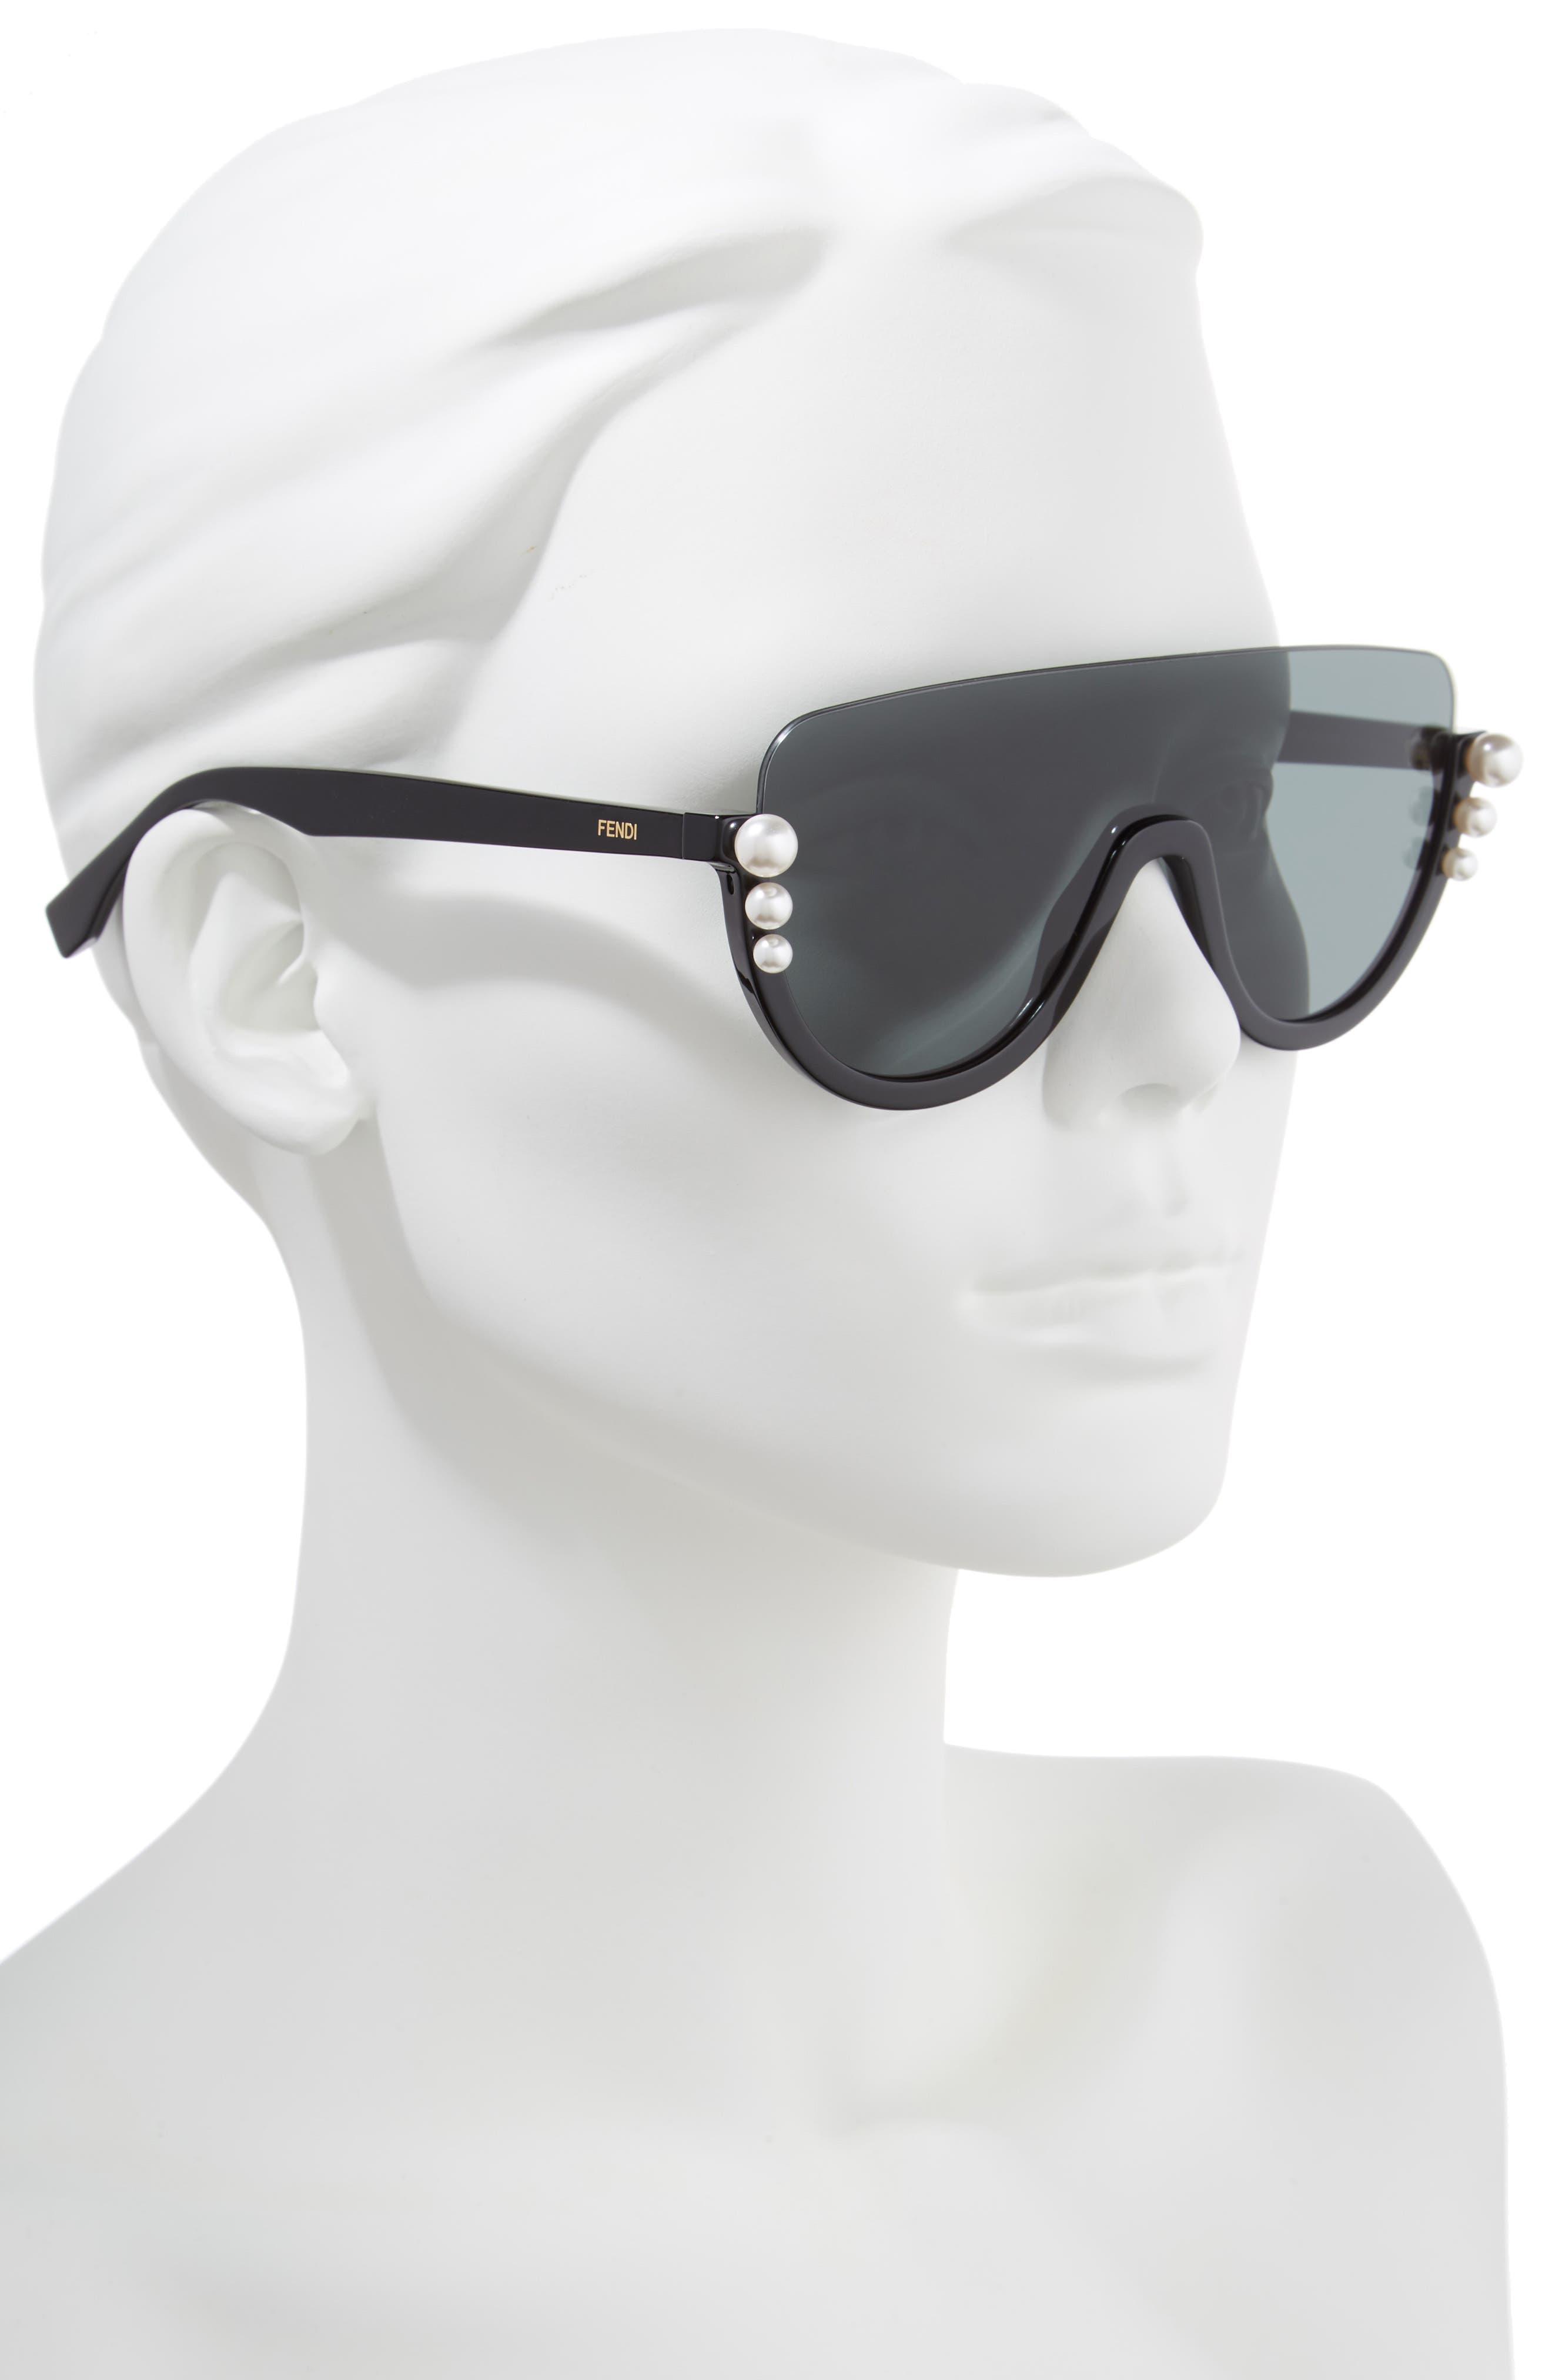 57mm Polarized Rimless Shield Sunglasses,                             Alternate thumbnail 2, color,                             001